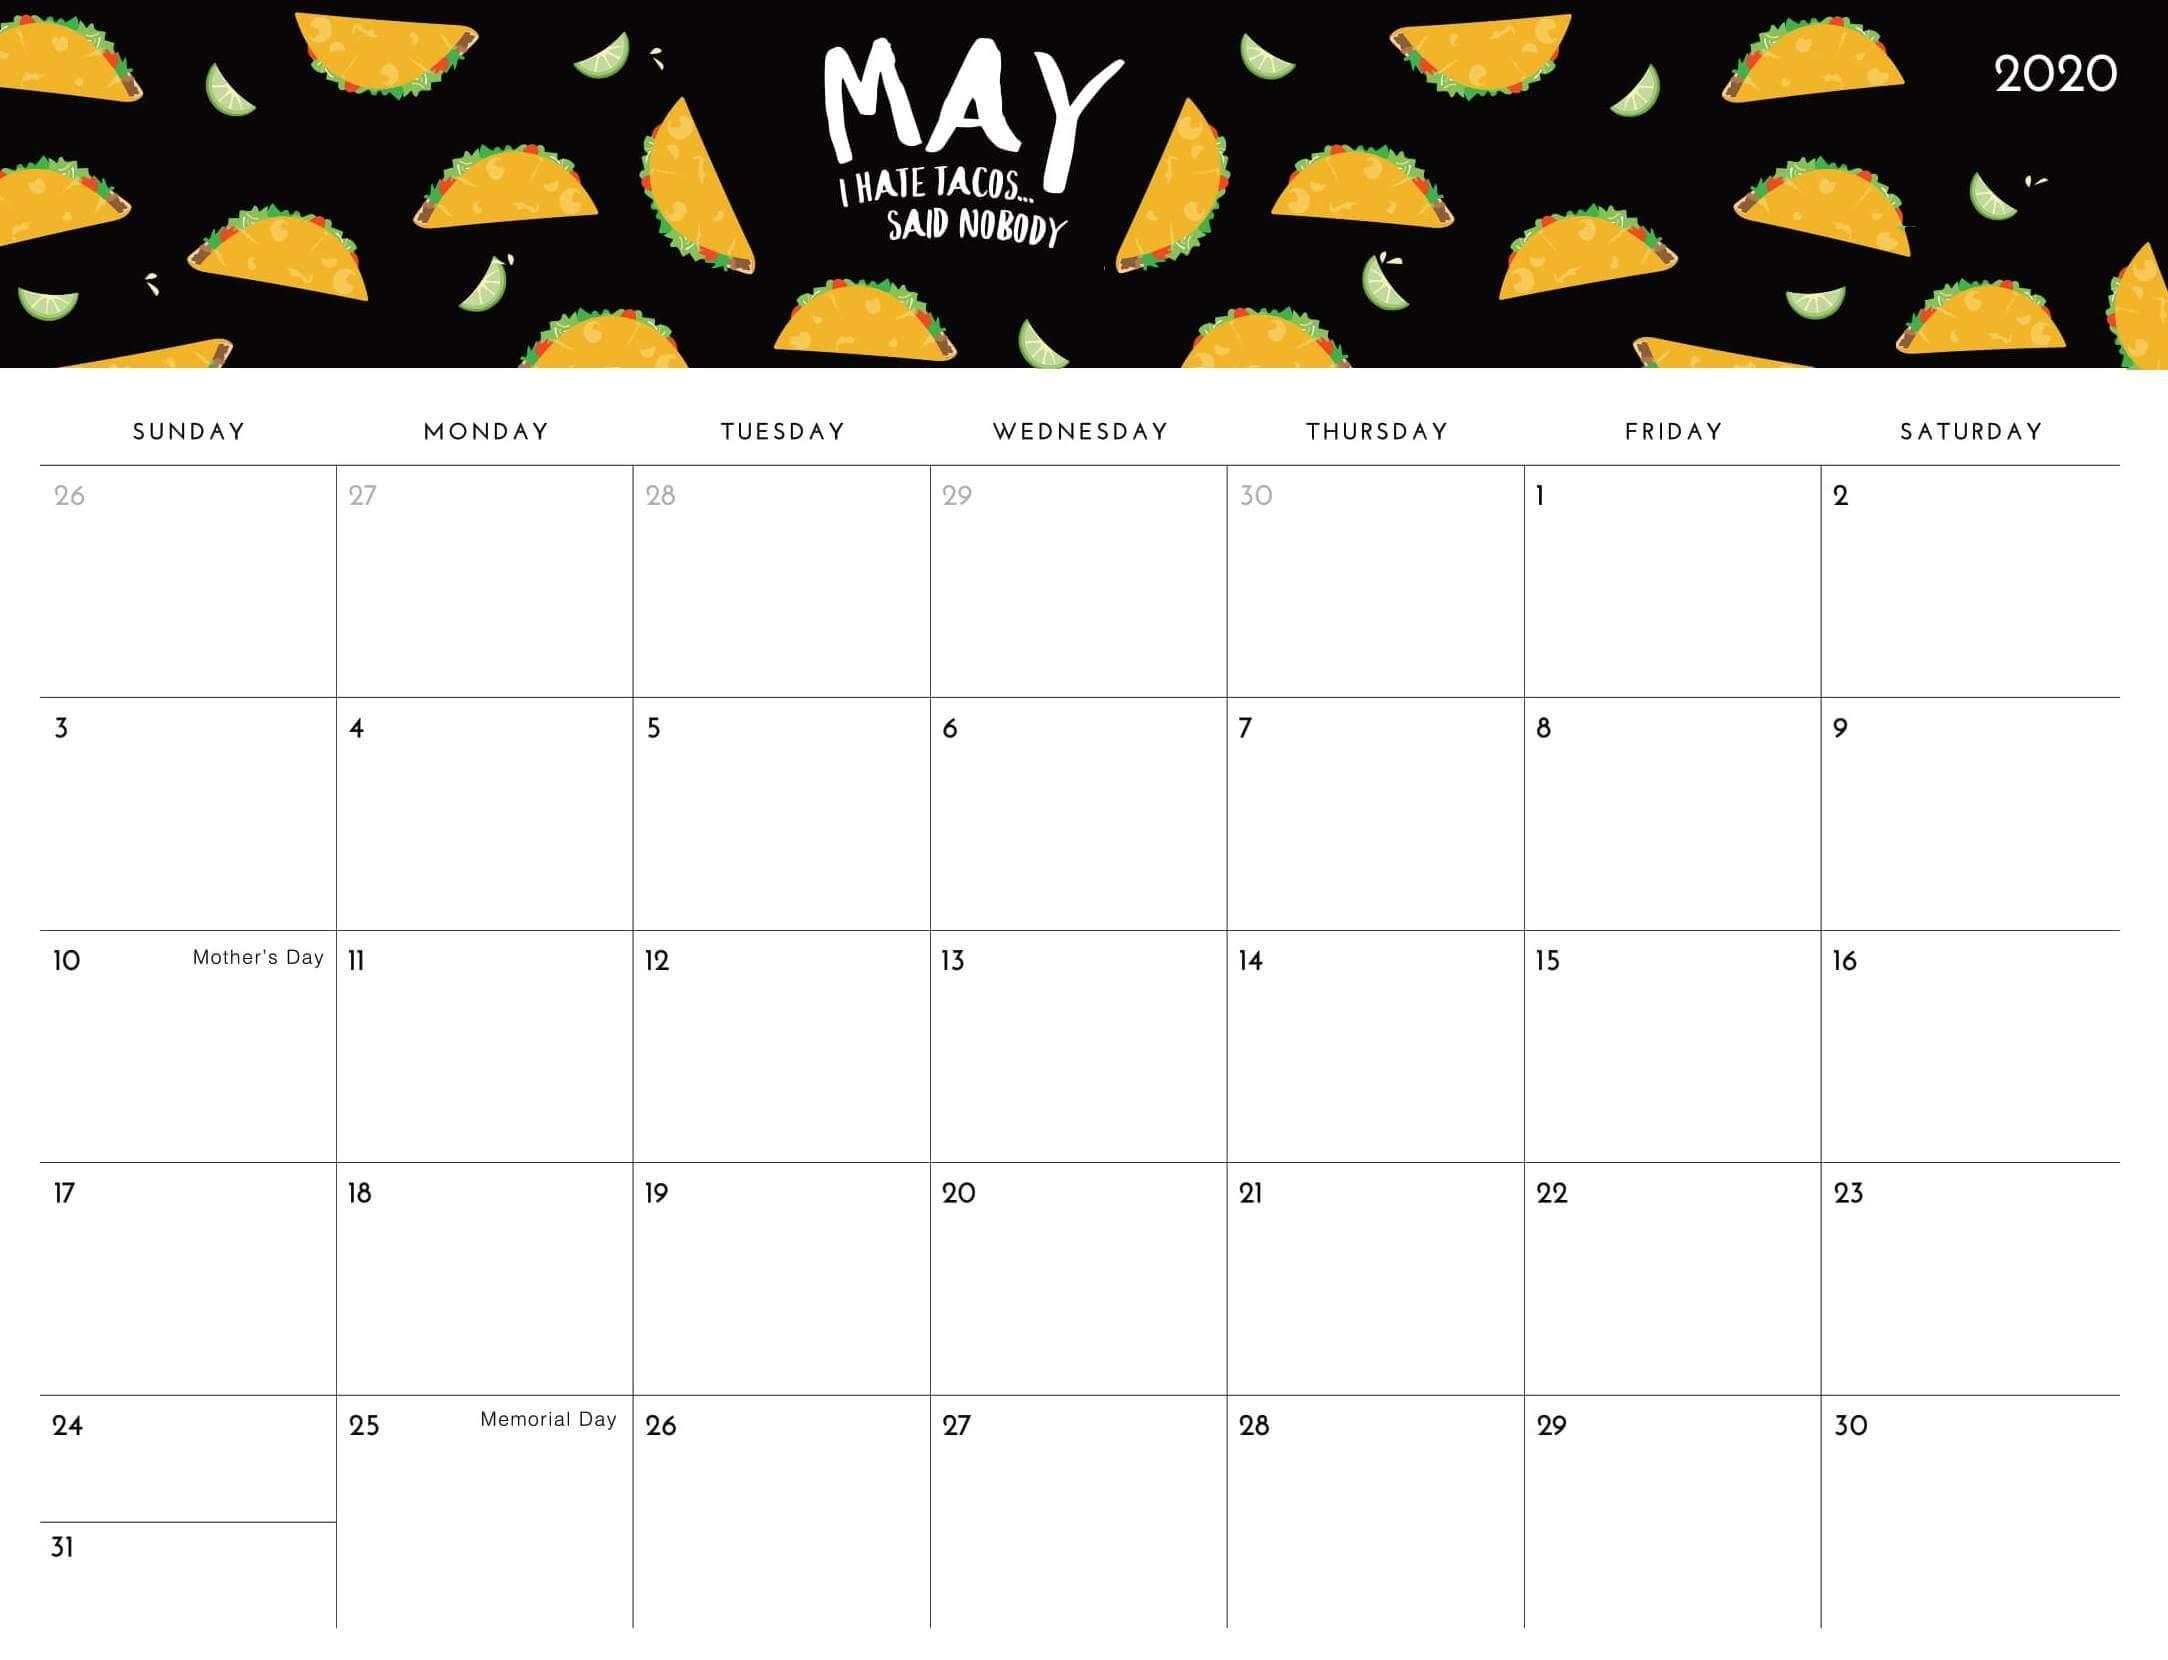 Decorative May 2020 Calendar Template